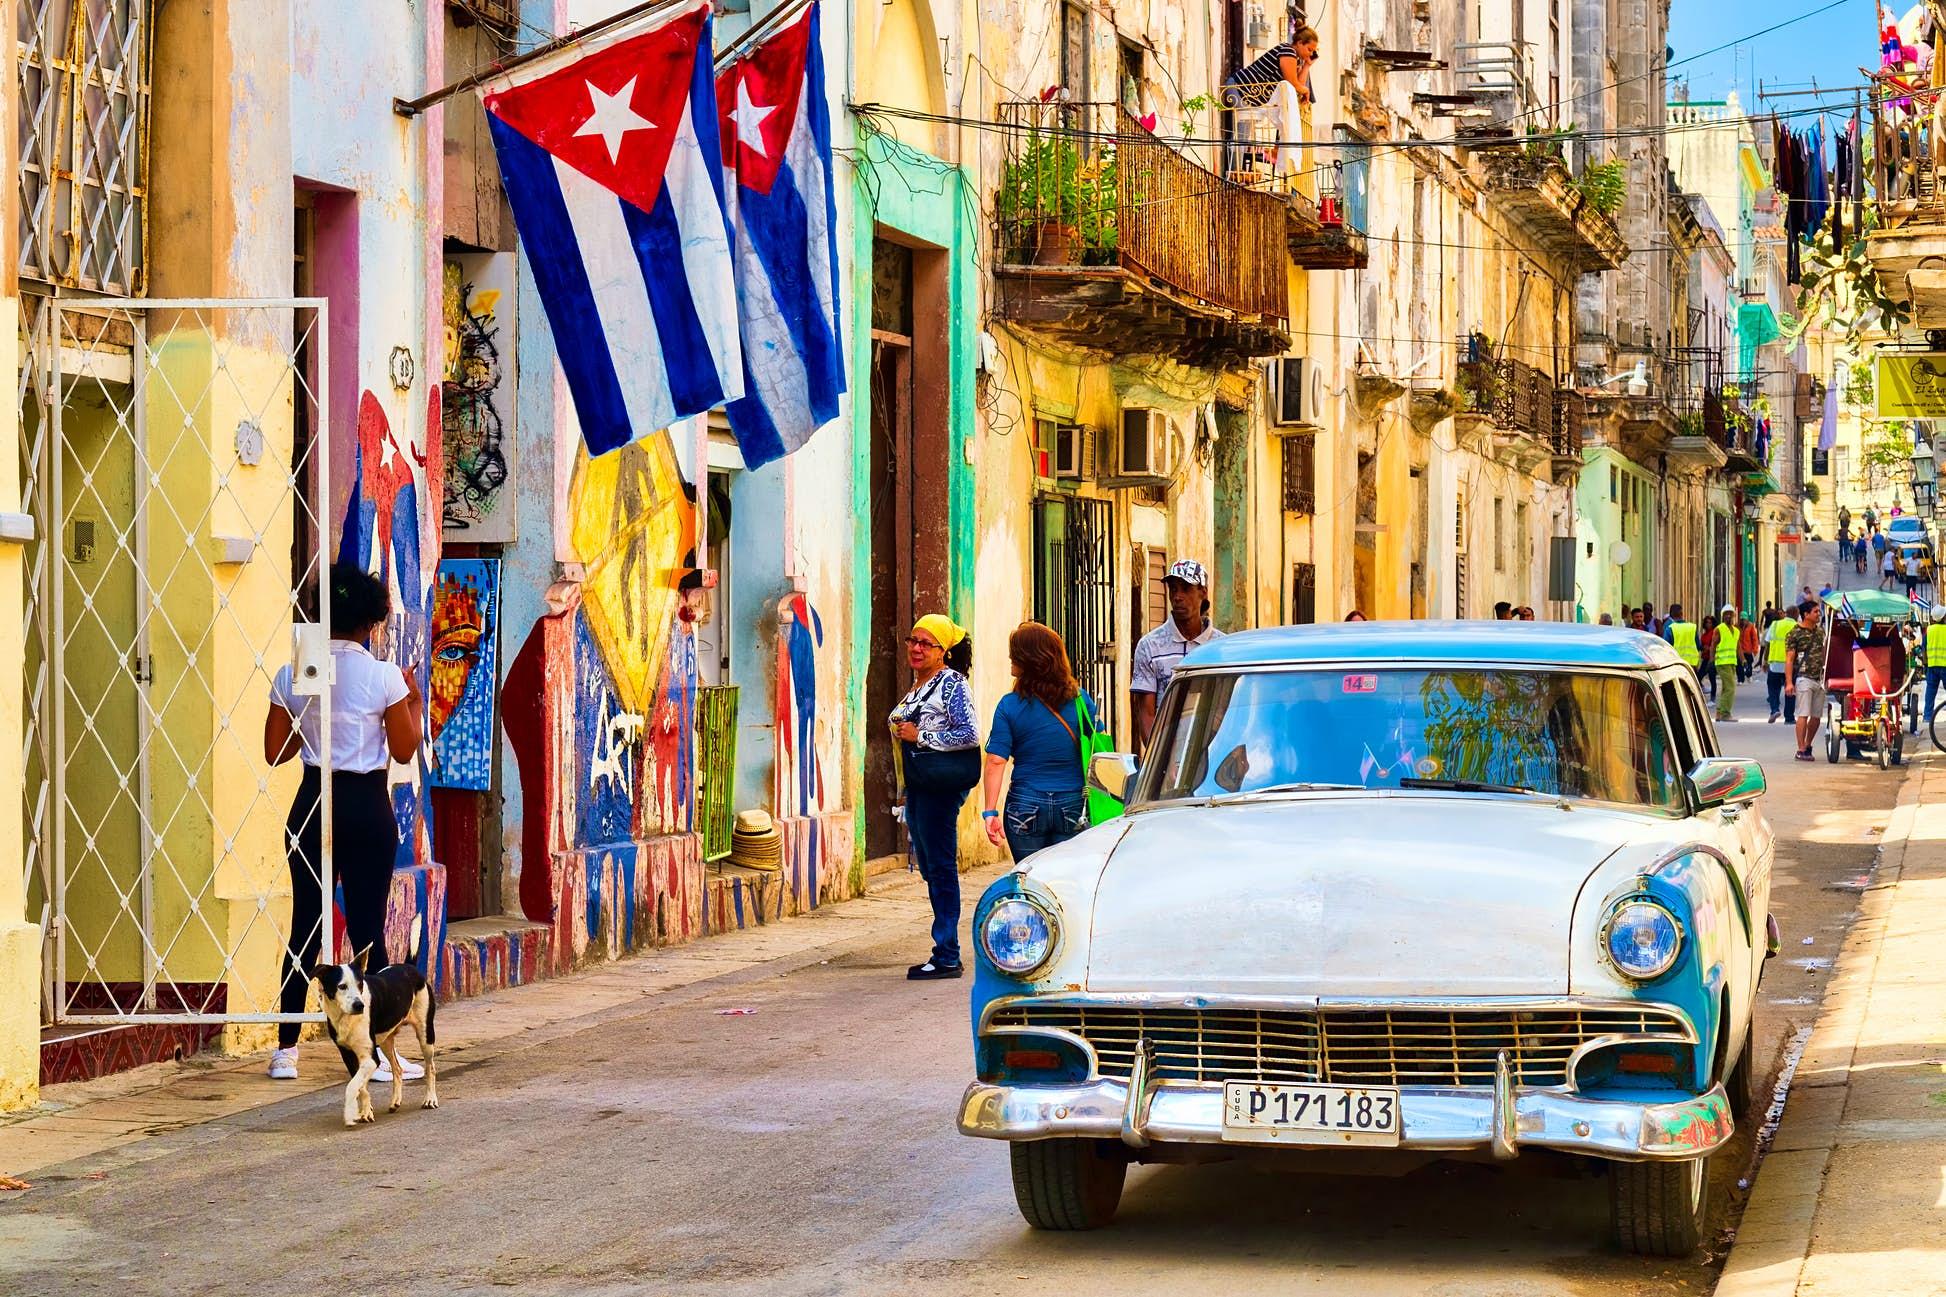 Havana will remain off-limits to international visitors until phase three © Kamira/Shutterstock